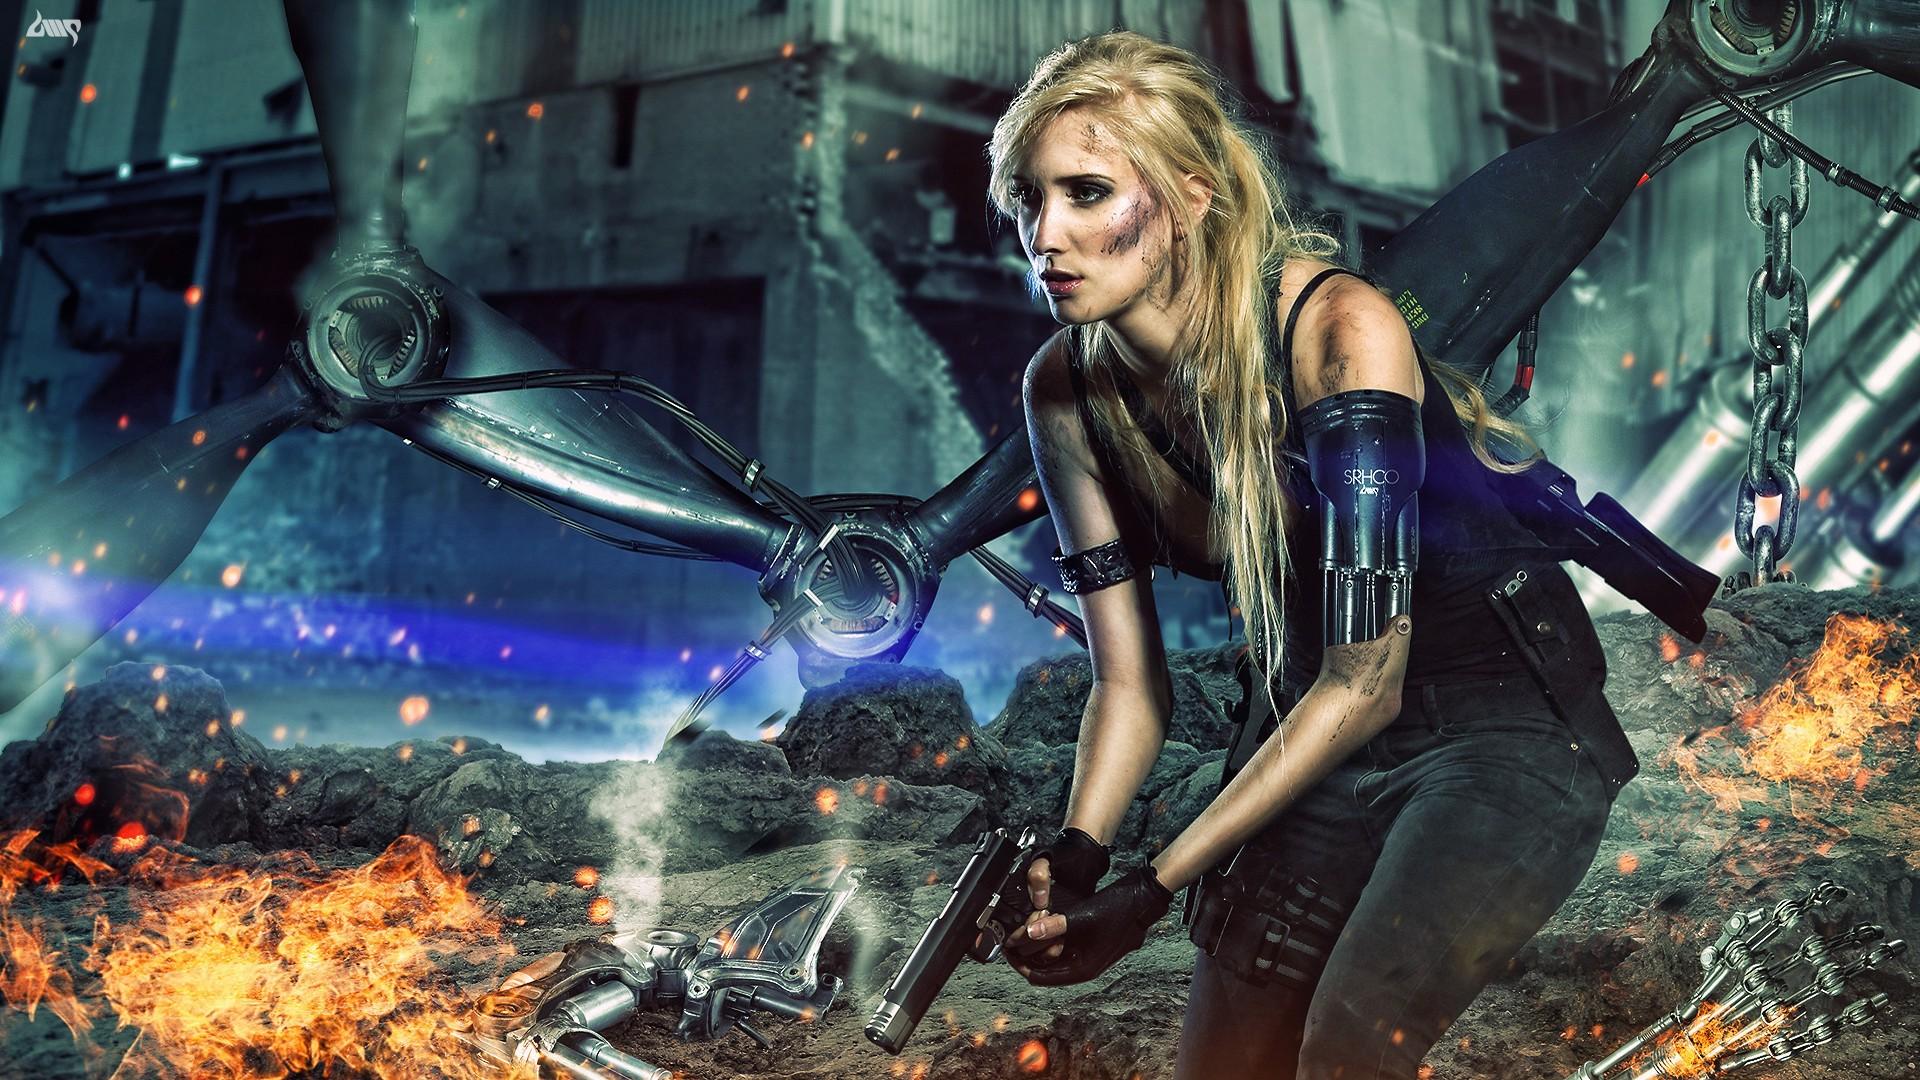 Women Warrior Artwork Sword Rain Cyberpunk Cyberpunk: Wallpaper : Gun, Women, Blonde, Cyberpunk, Comics, Girls